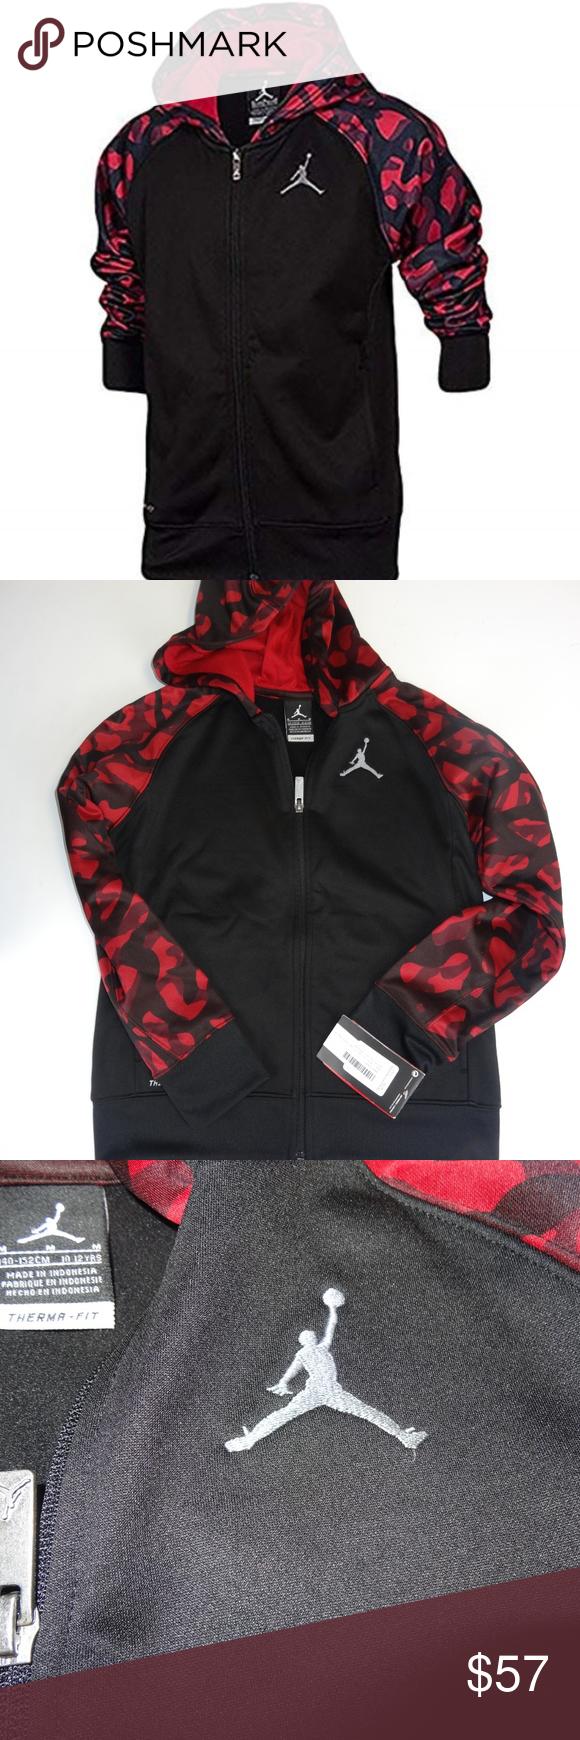 44c8c3bdc08438 Nike Jordan Boys AJ Camo Full-Zip NWT Nike Jordan Little Boys AJ Camo Full